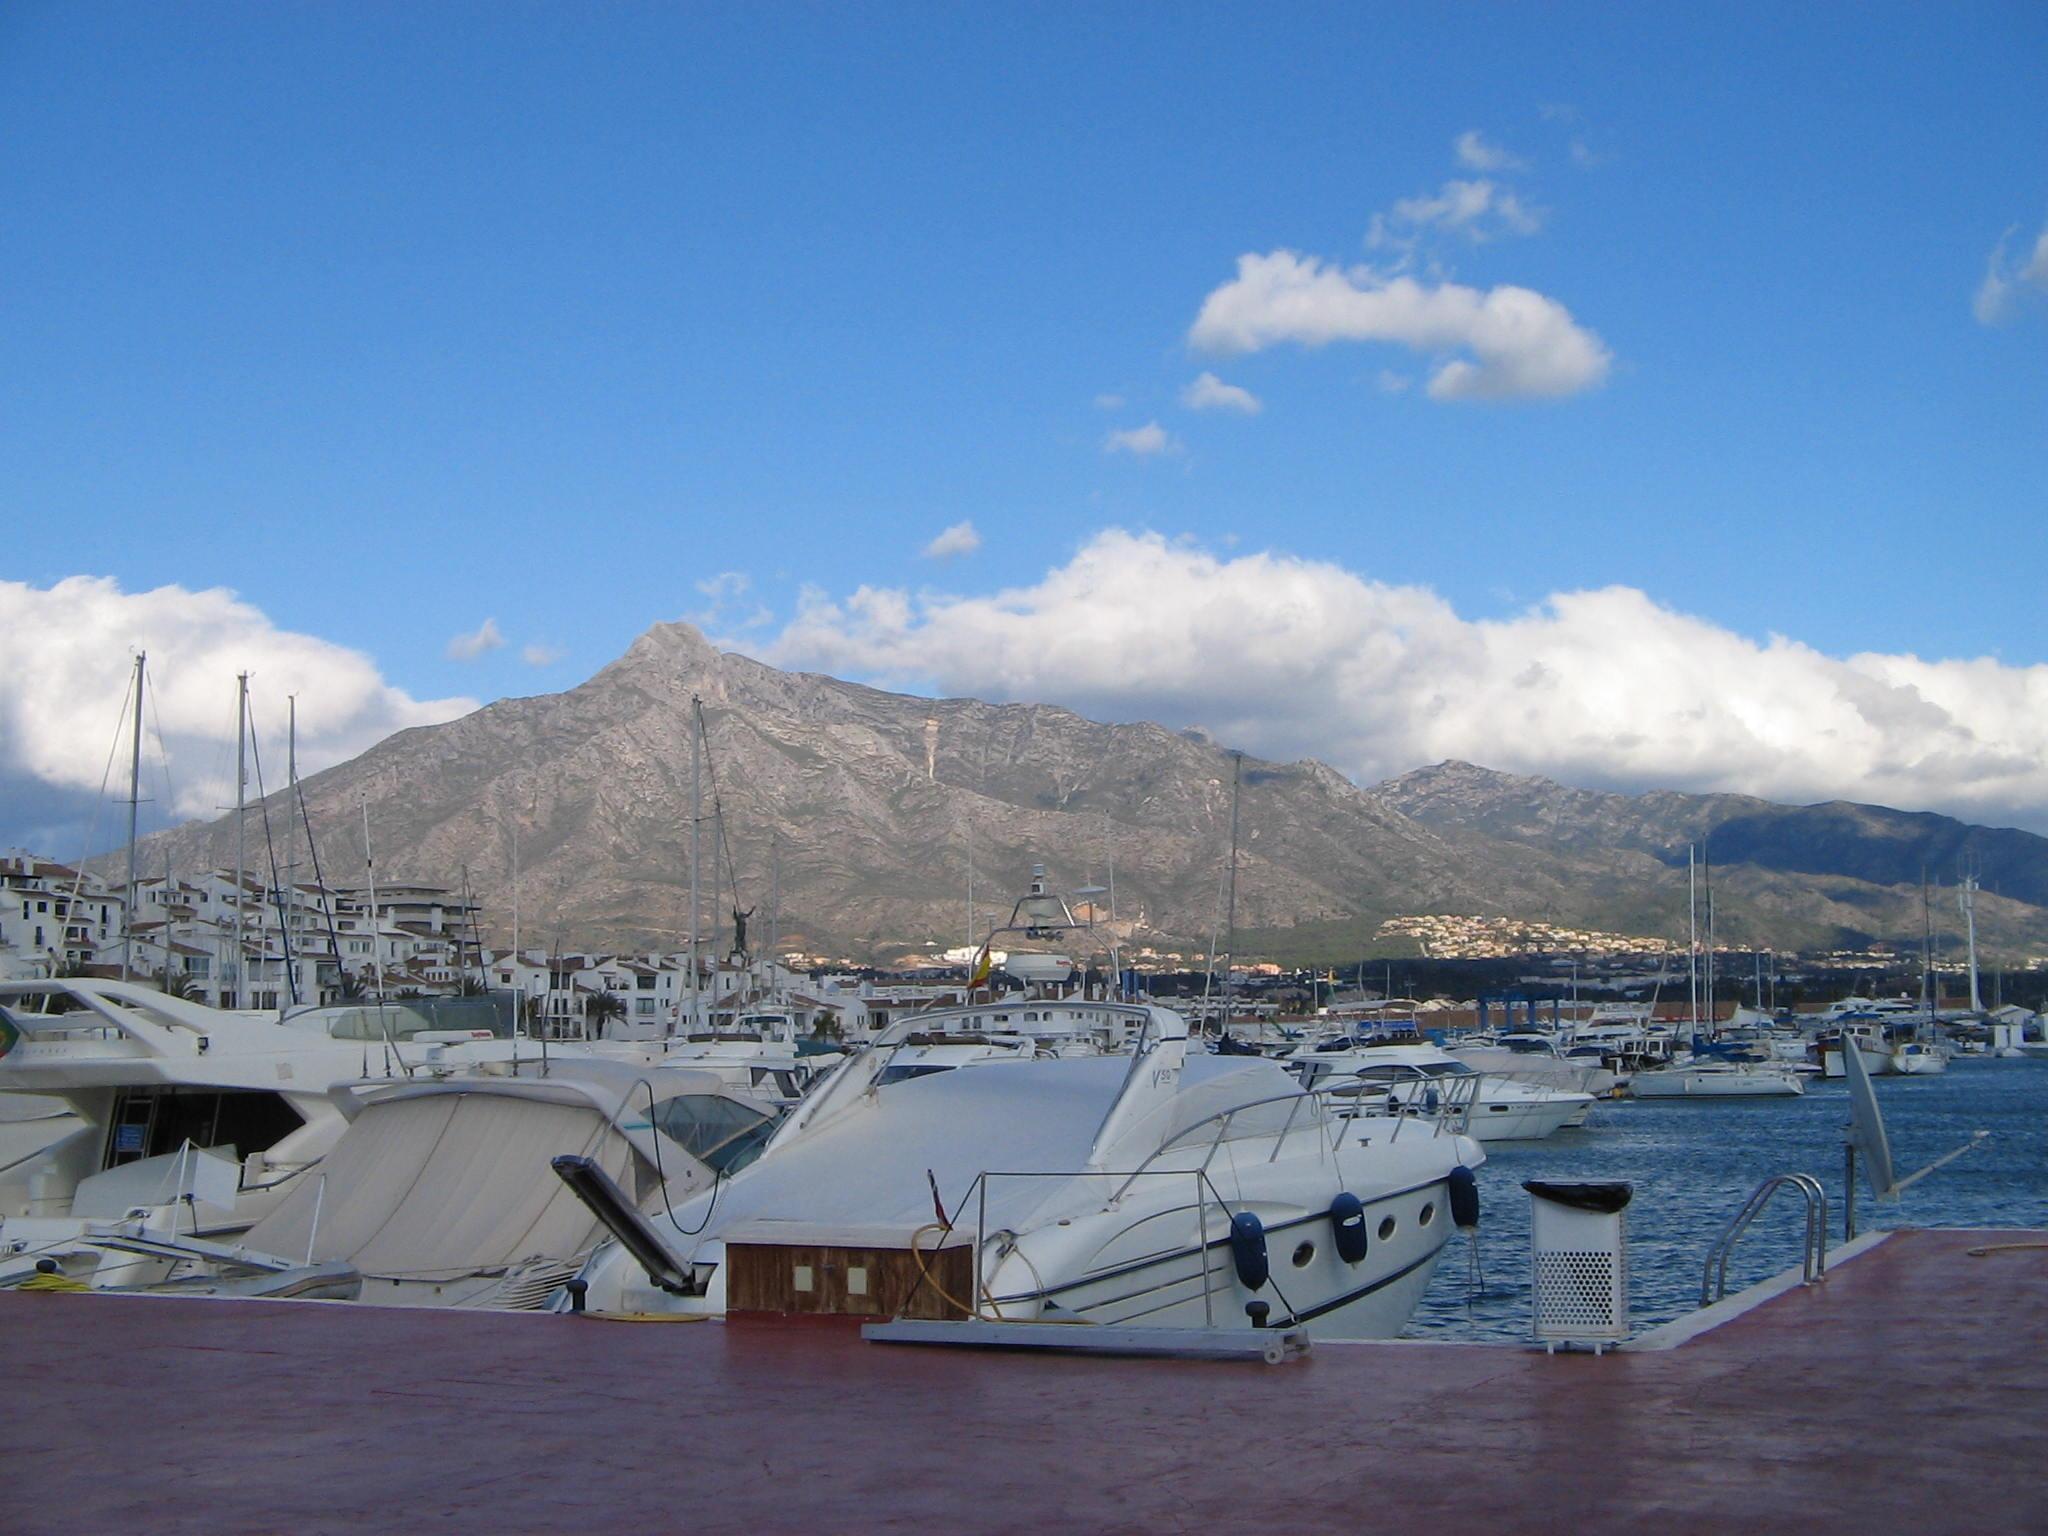 file harbor in puerto banus costa del sol spain dec On puerto banus costa del sol